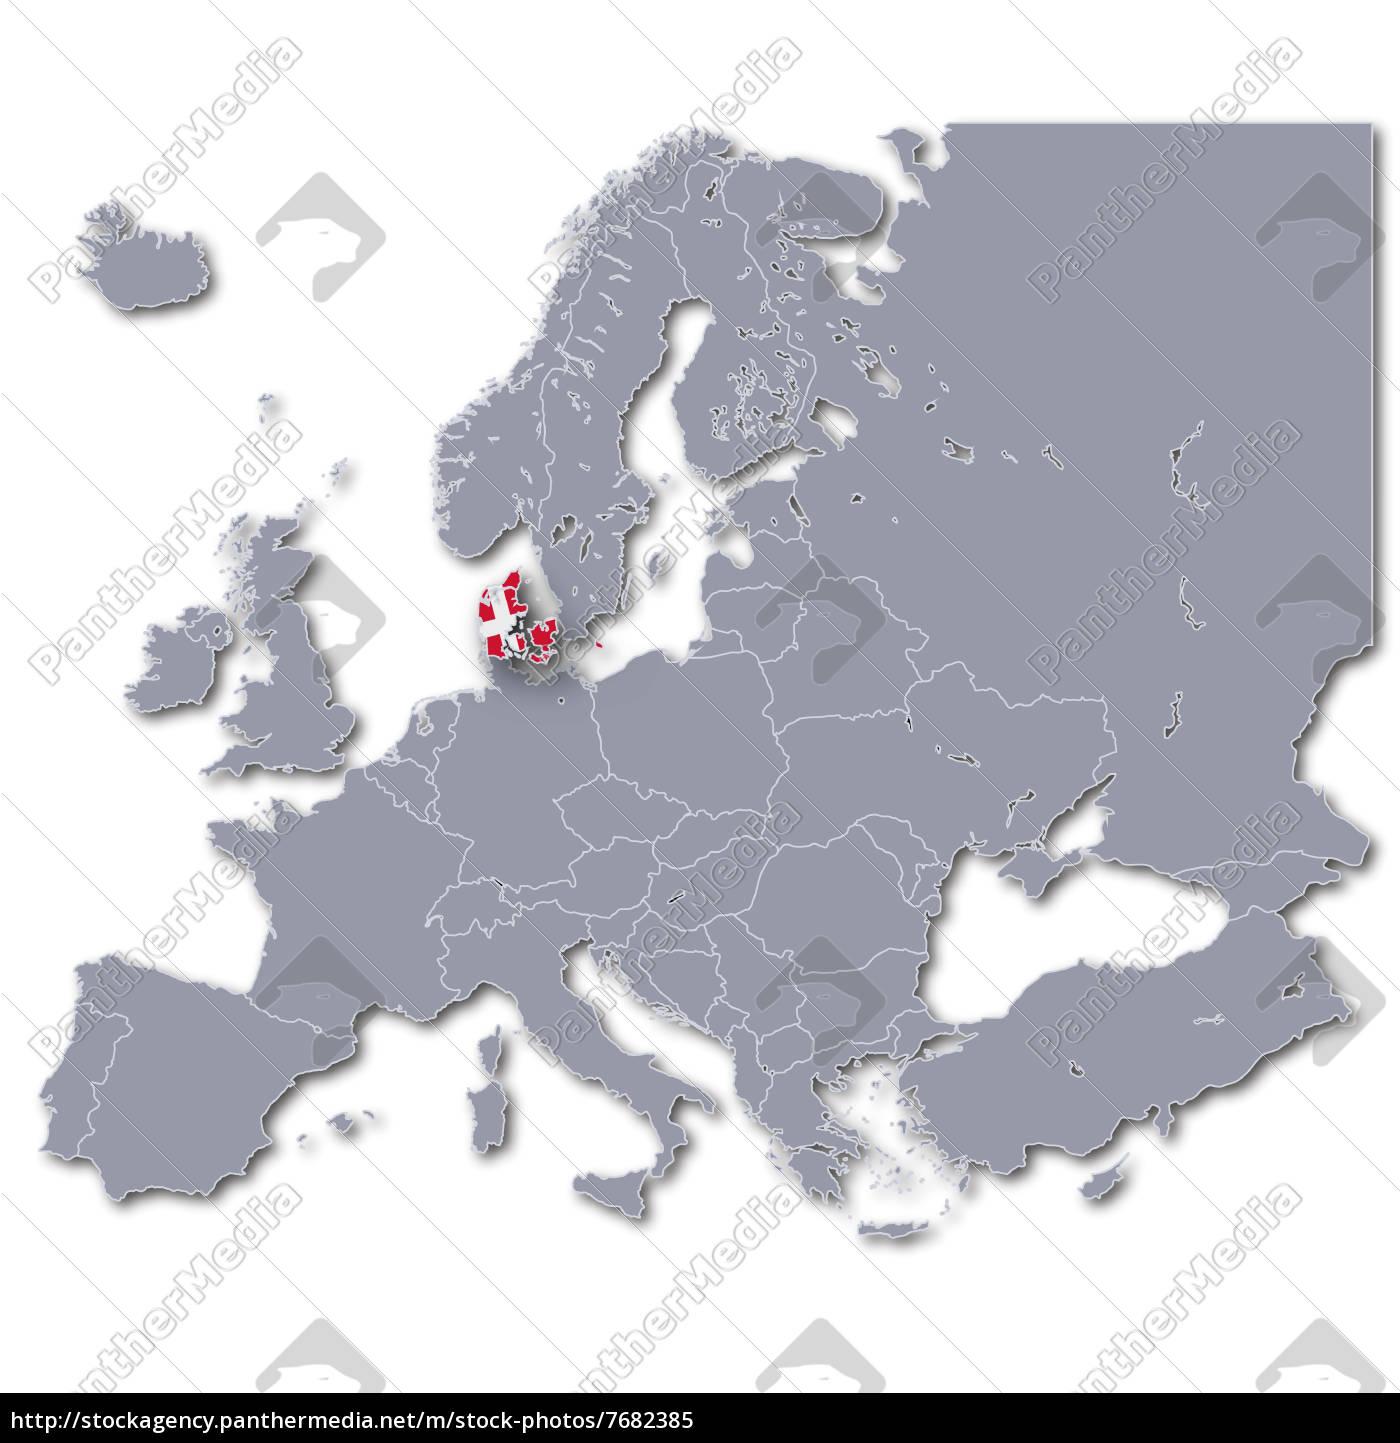 Royalty free image 7682385 - europe map denmark